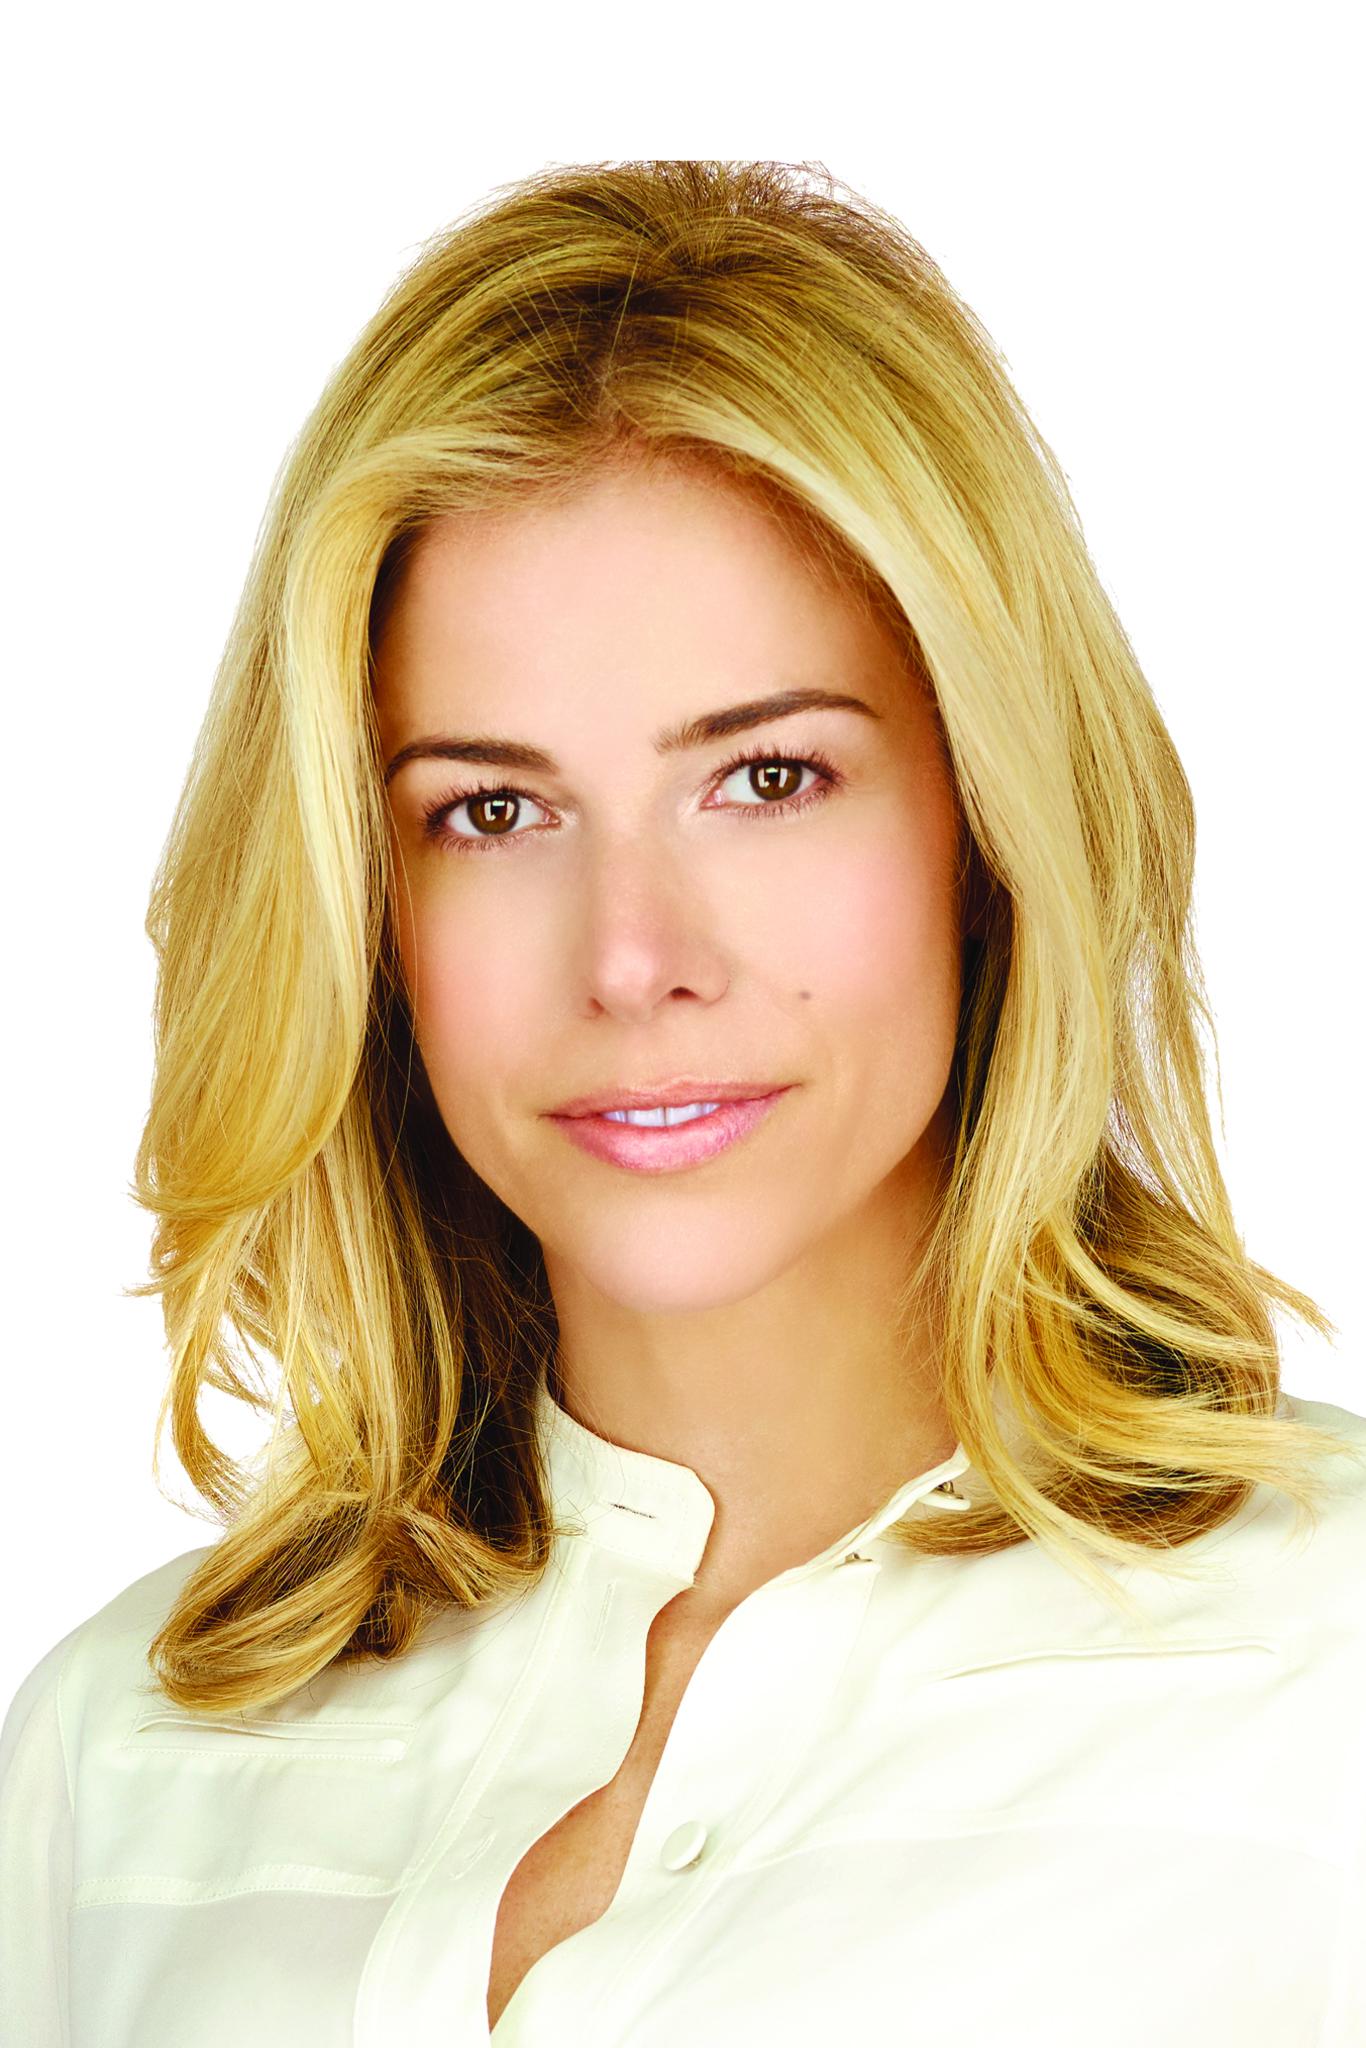 Marisa Vara Arredondo, creator of Phase Bioactive Skincare